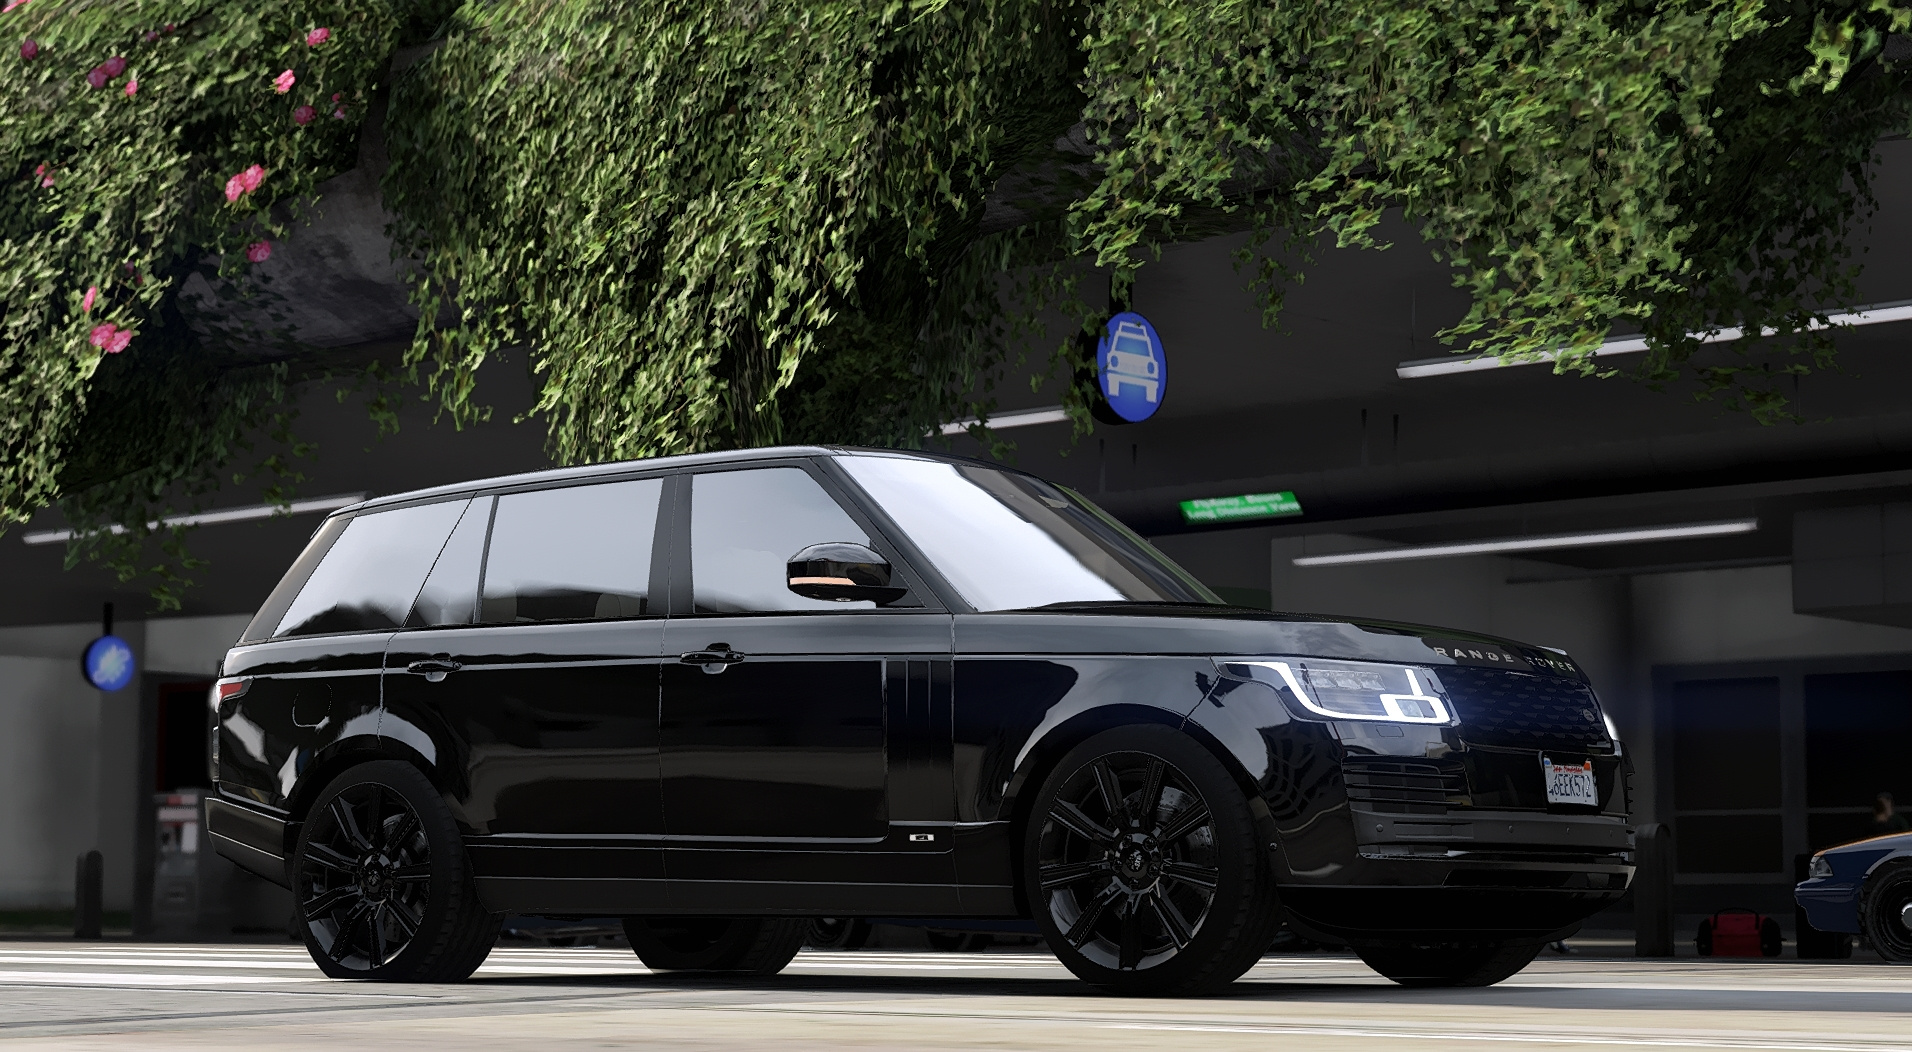 Range Rover Autobiography >> Land Rover Range Rover SV Autobiography LWB 2018 - GTA5 ...